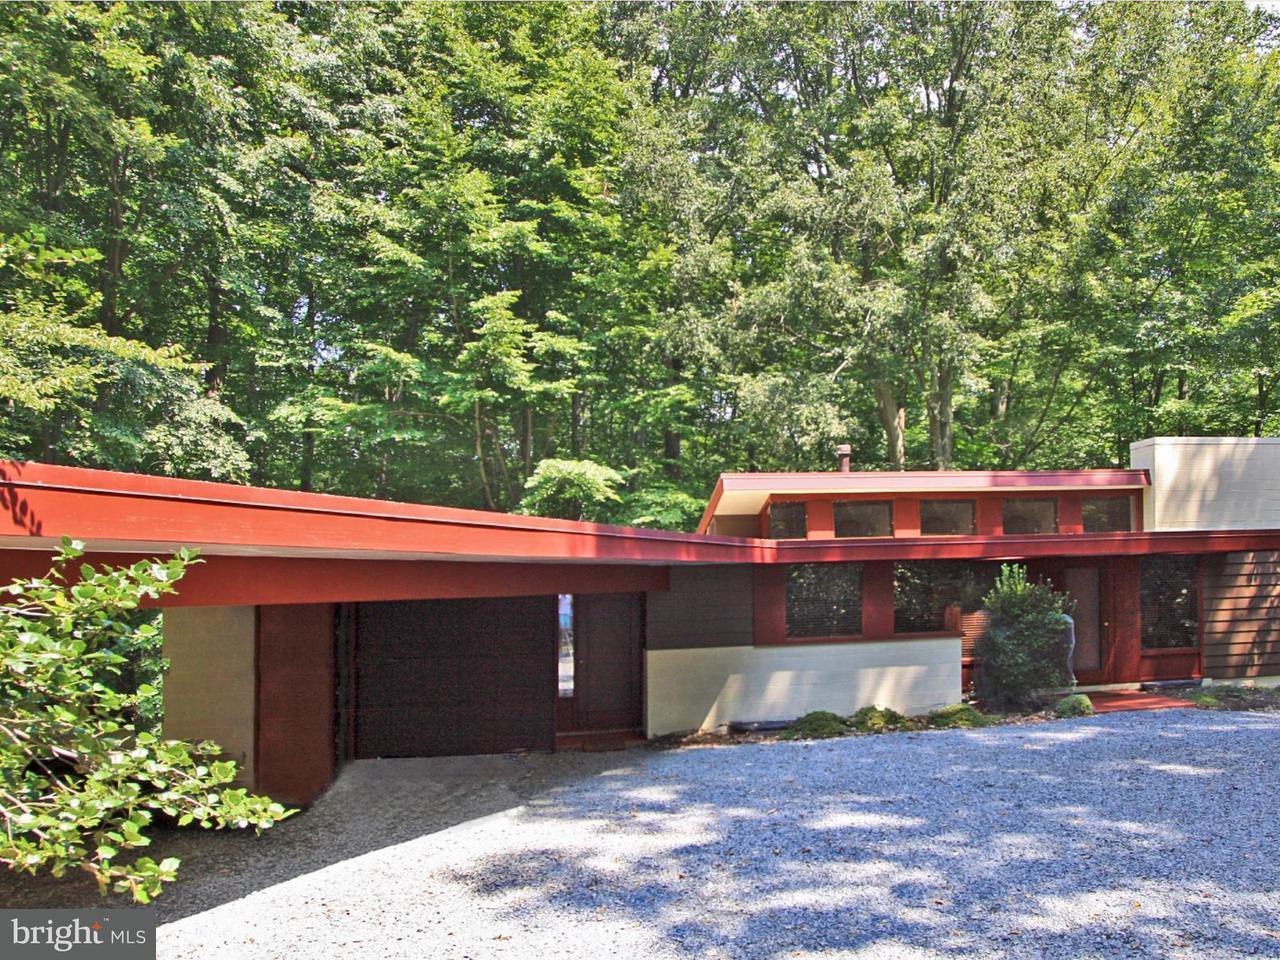 Land for Sale at 103 Jefferson Run Road 103 Jefferson Run Road Great Falls, Virginia 22066 United States